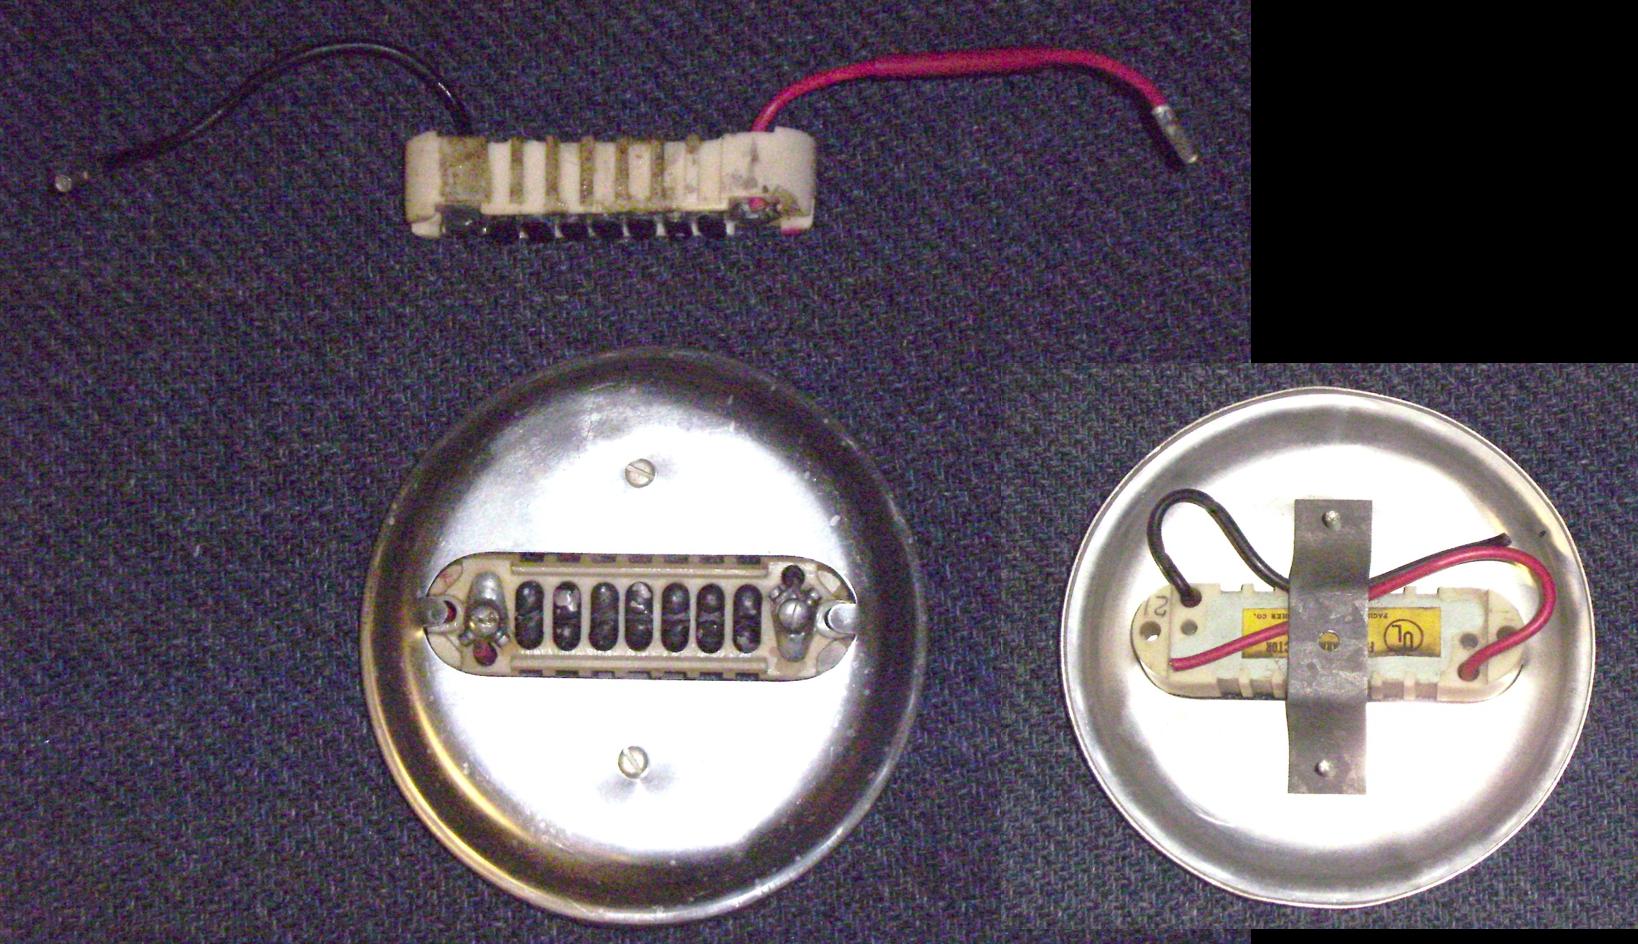 Reichel Automatic Fire Detector